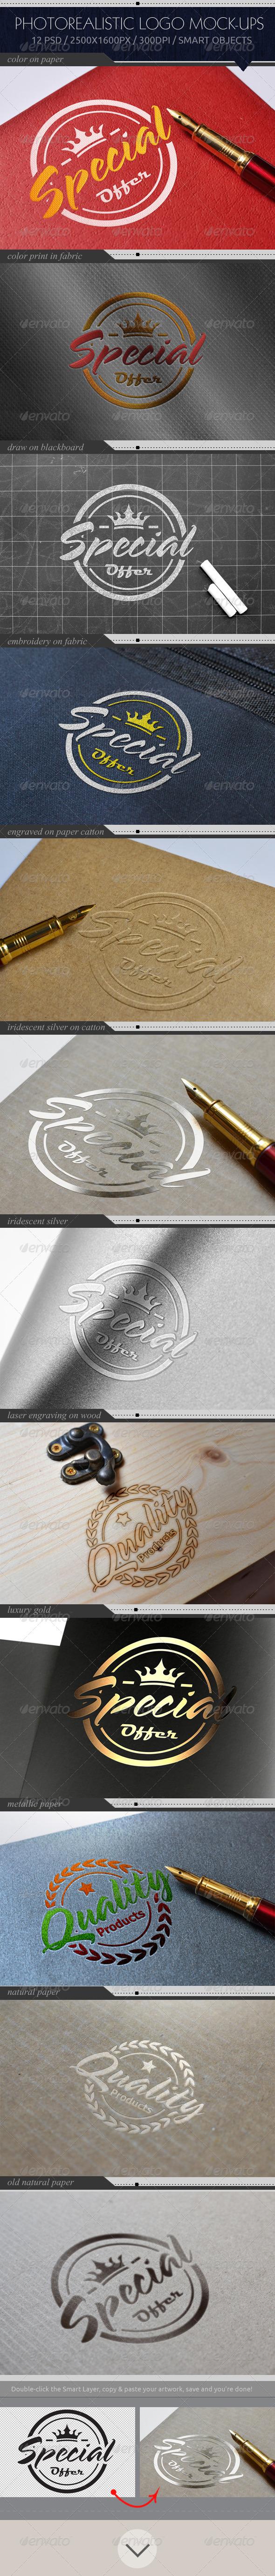 GraphicRiver Photorealistic Logo Mock-Ups 7941892